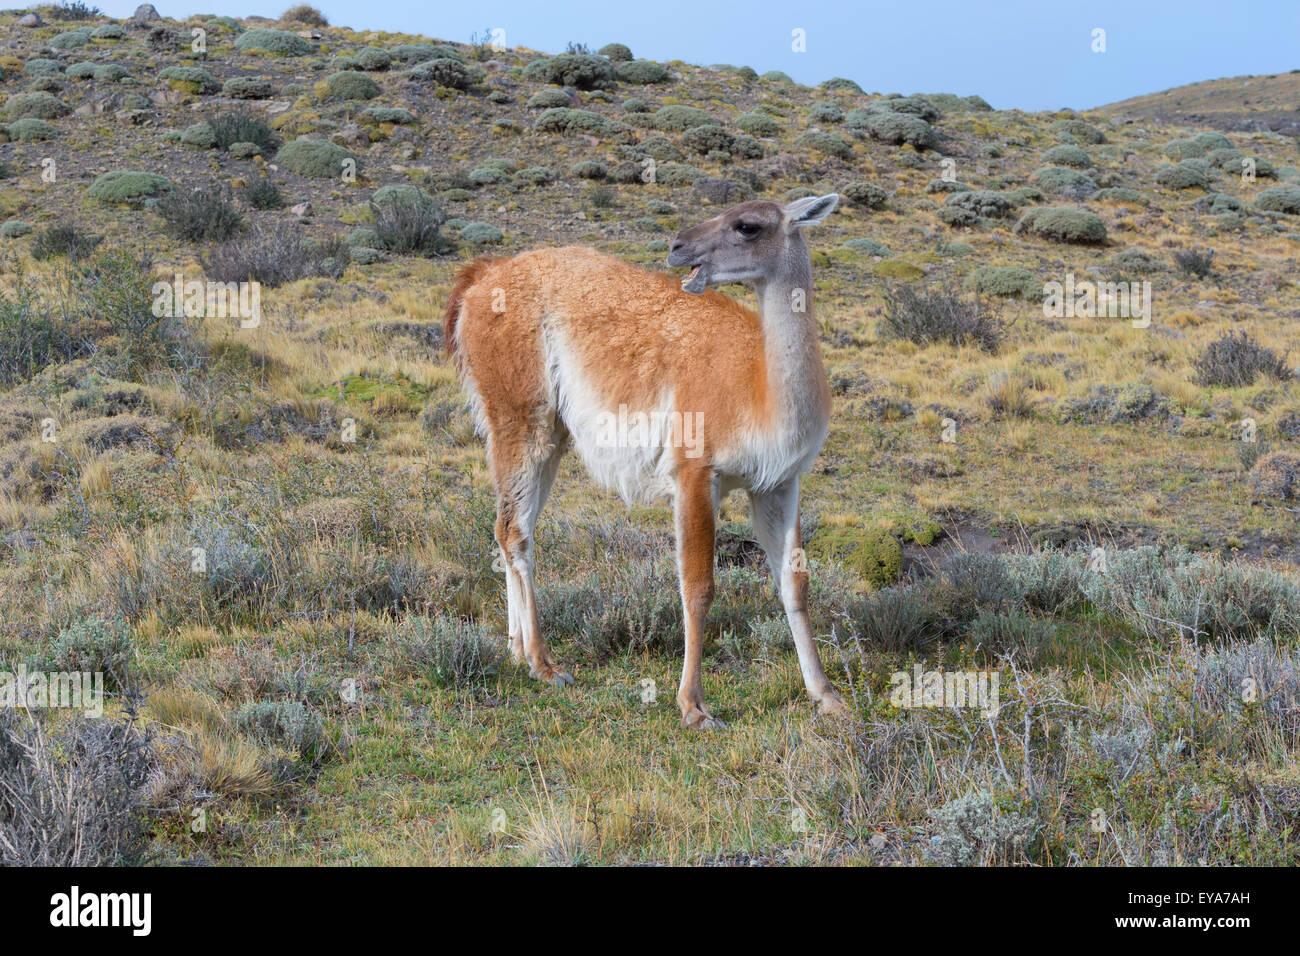 Guanaco (Lama guanicoe), Torres del Paine National Park, Chilean Patagonia, Chile - Stock Image